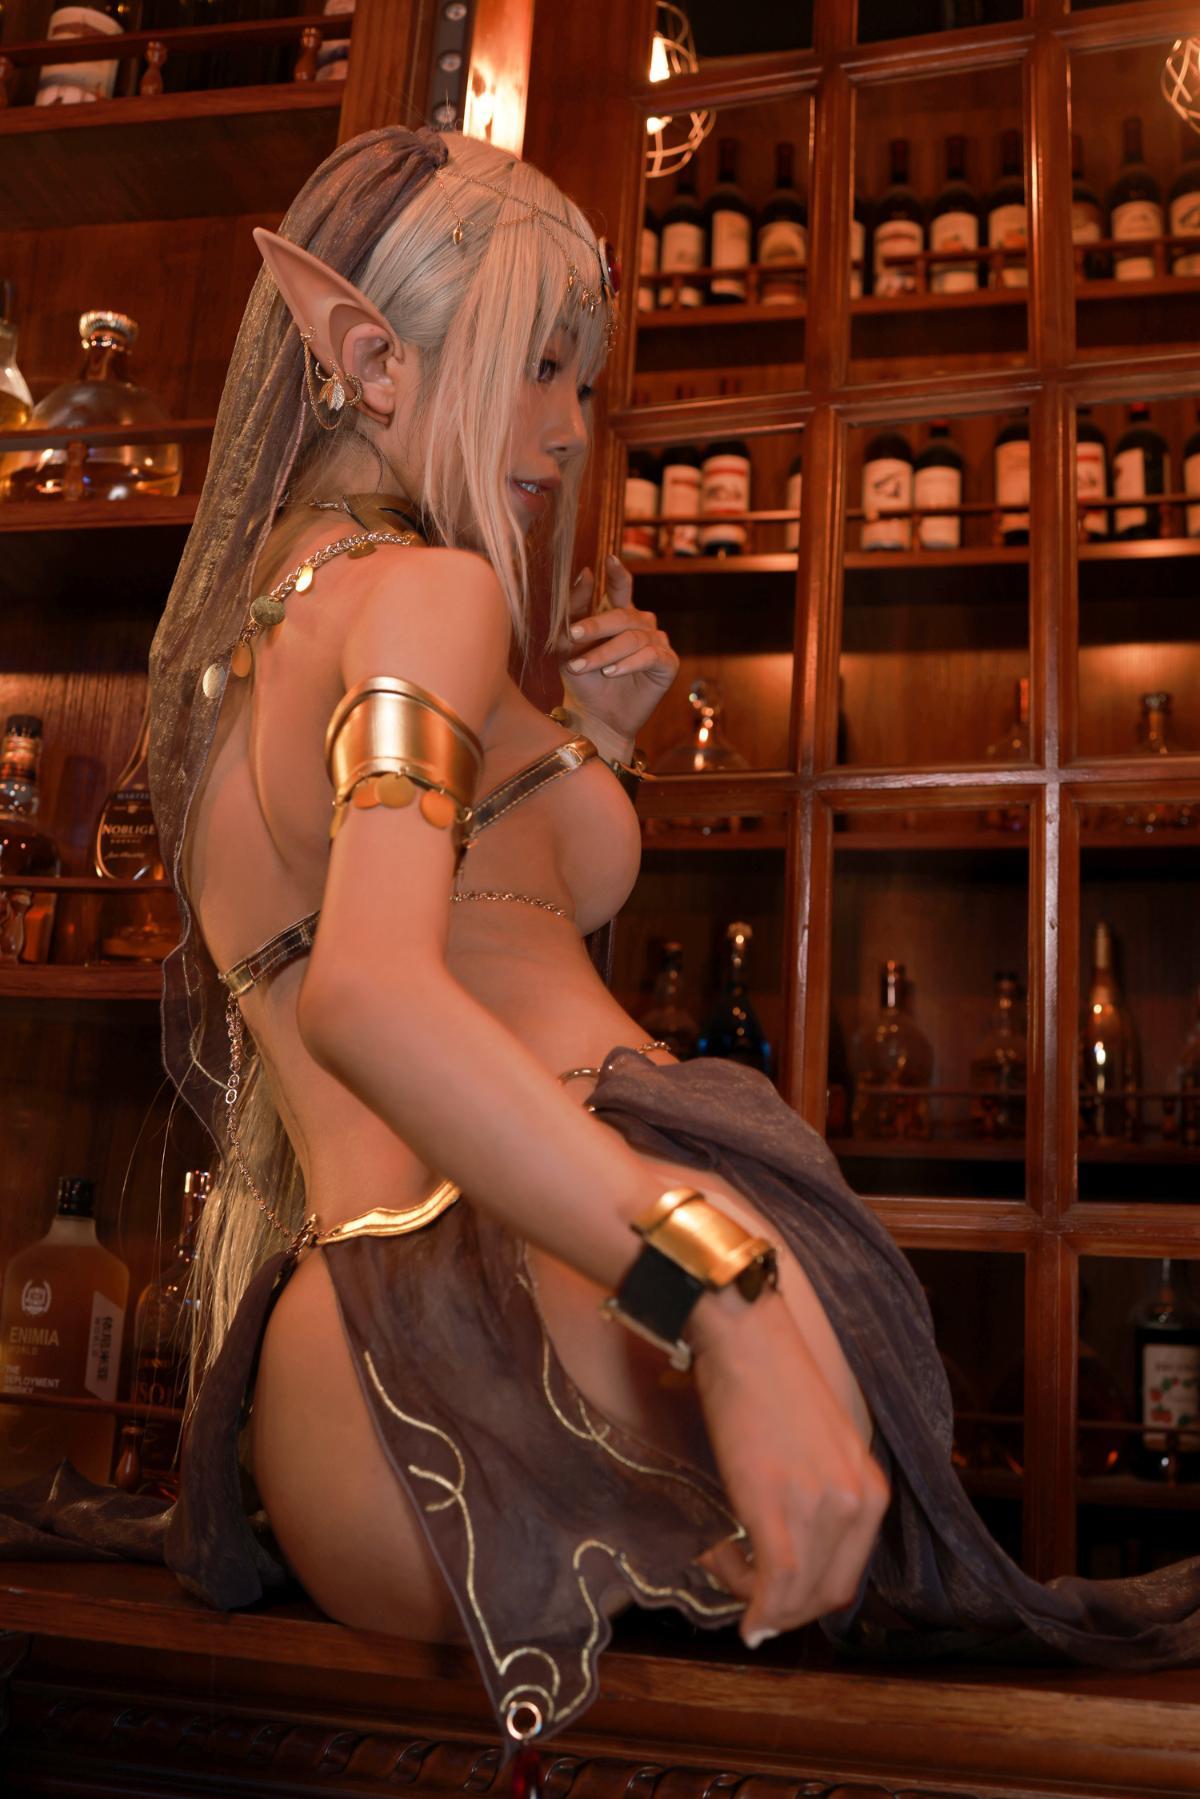 Tan Dancer Elf Succubus Cosplay by Aqua 38